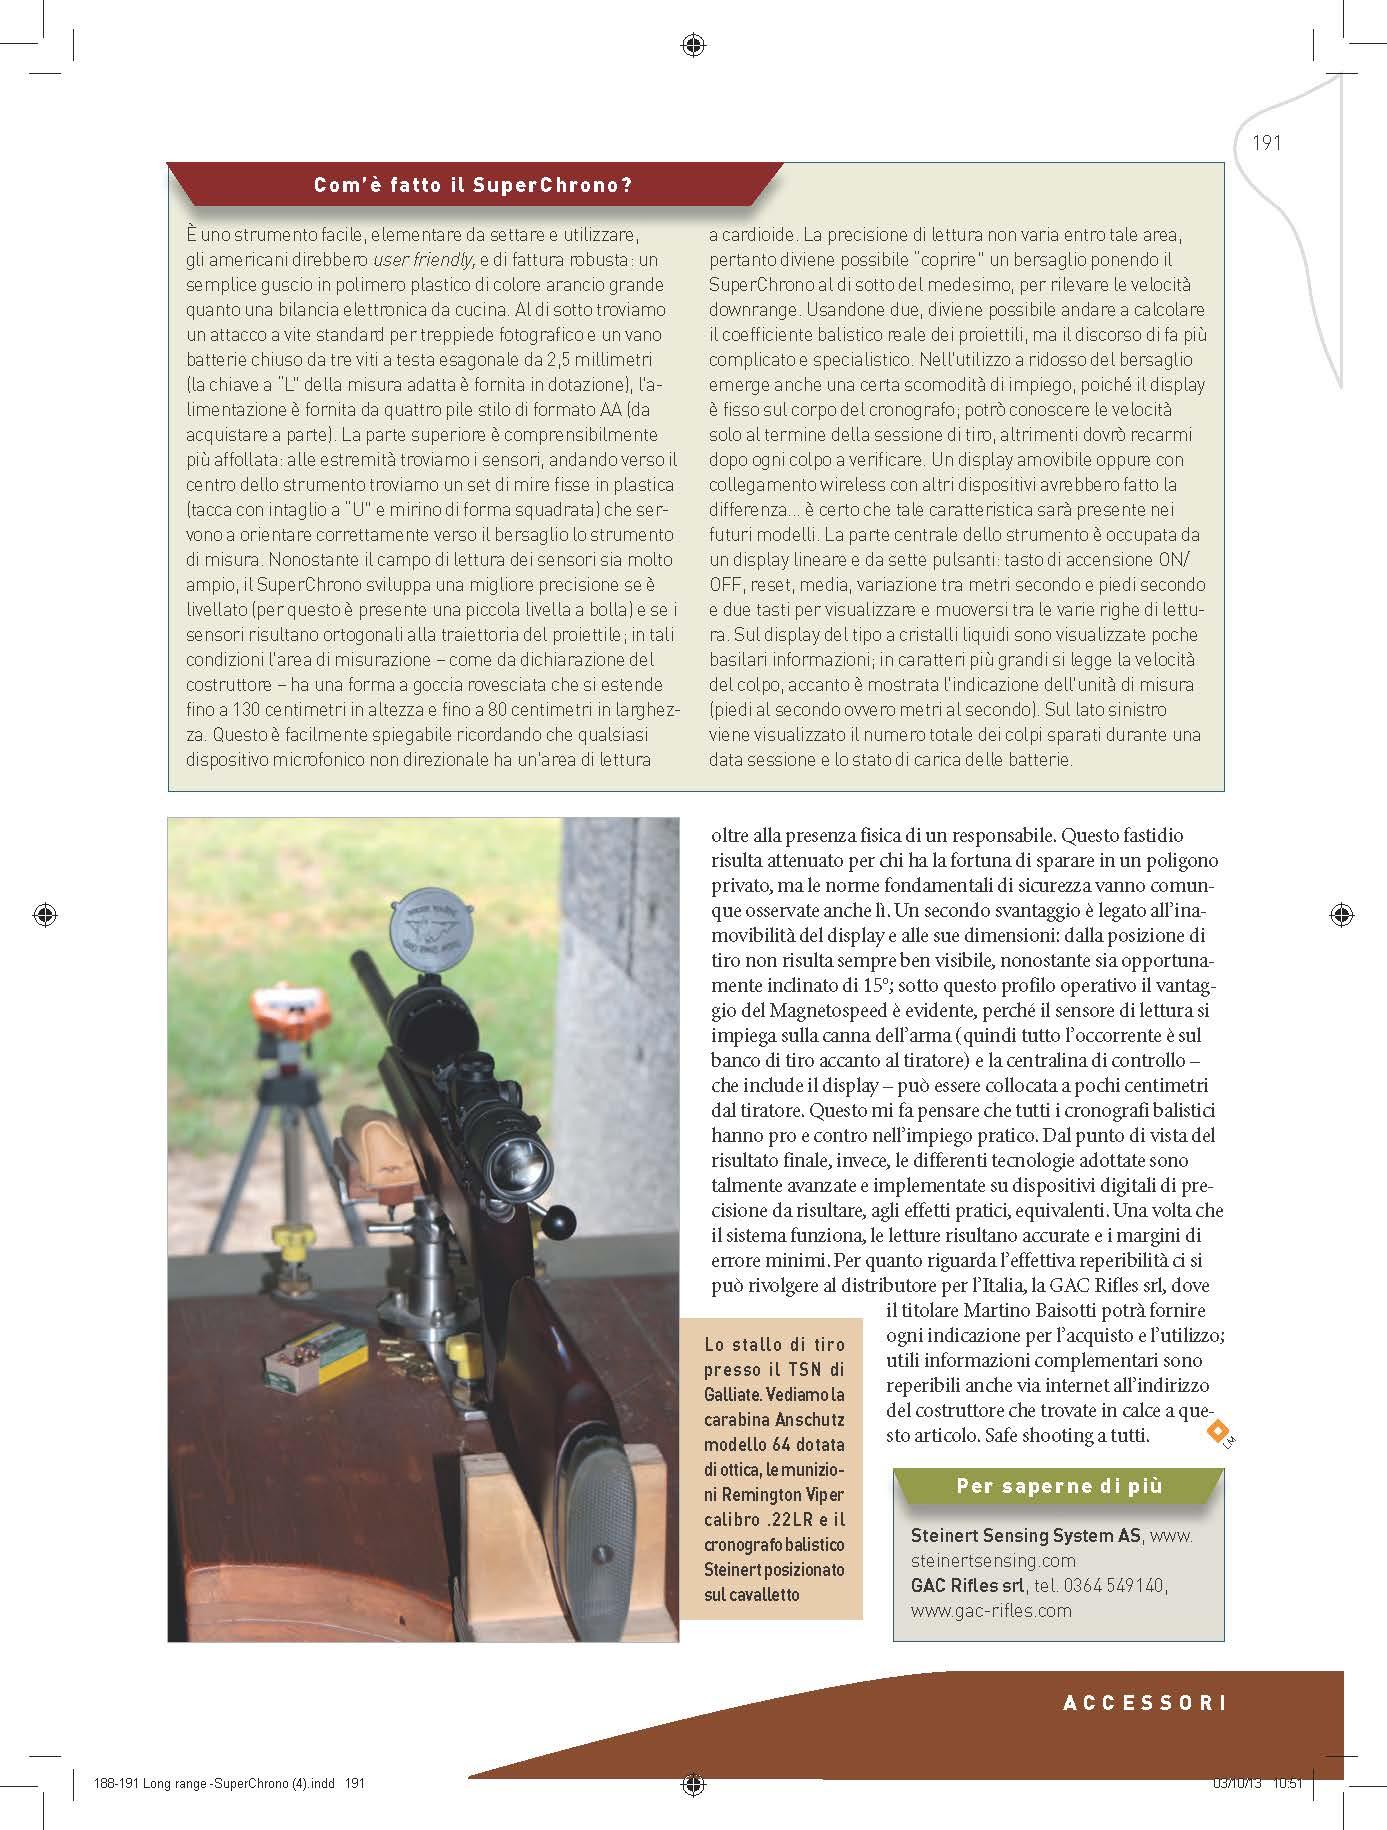 Armi Magazine November 2013 (3)_Page_4